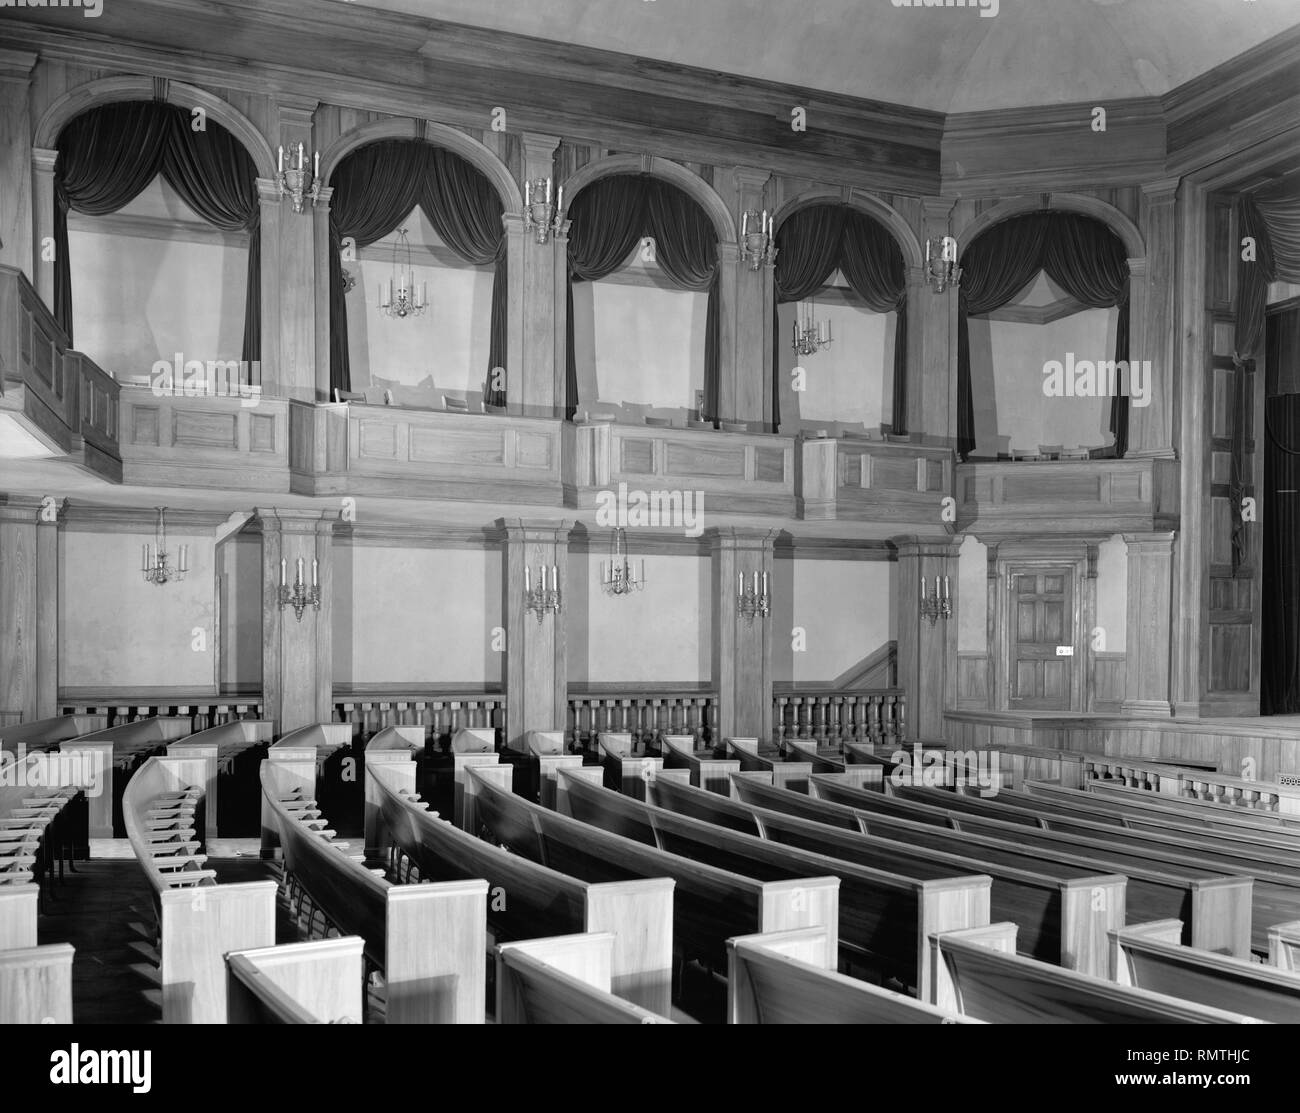 Dock Street Theater, Charleston, South Carolina, USA, Frances Benjamin Johnston, 1937 - Stock Image